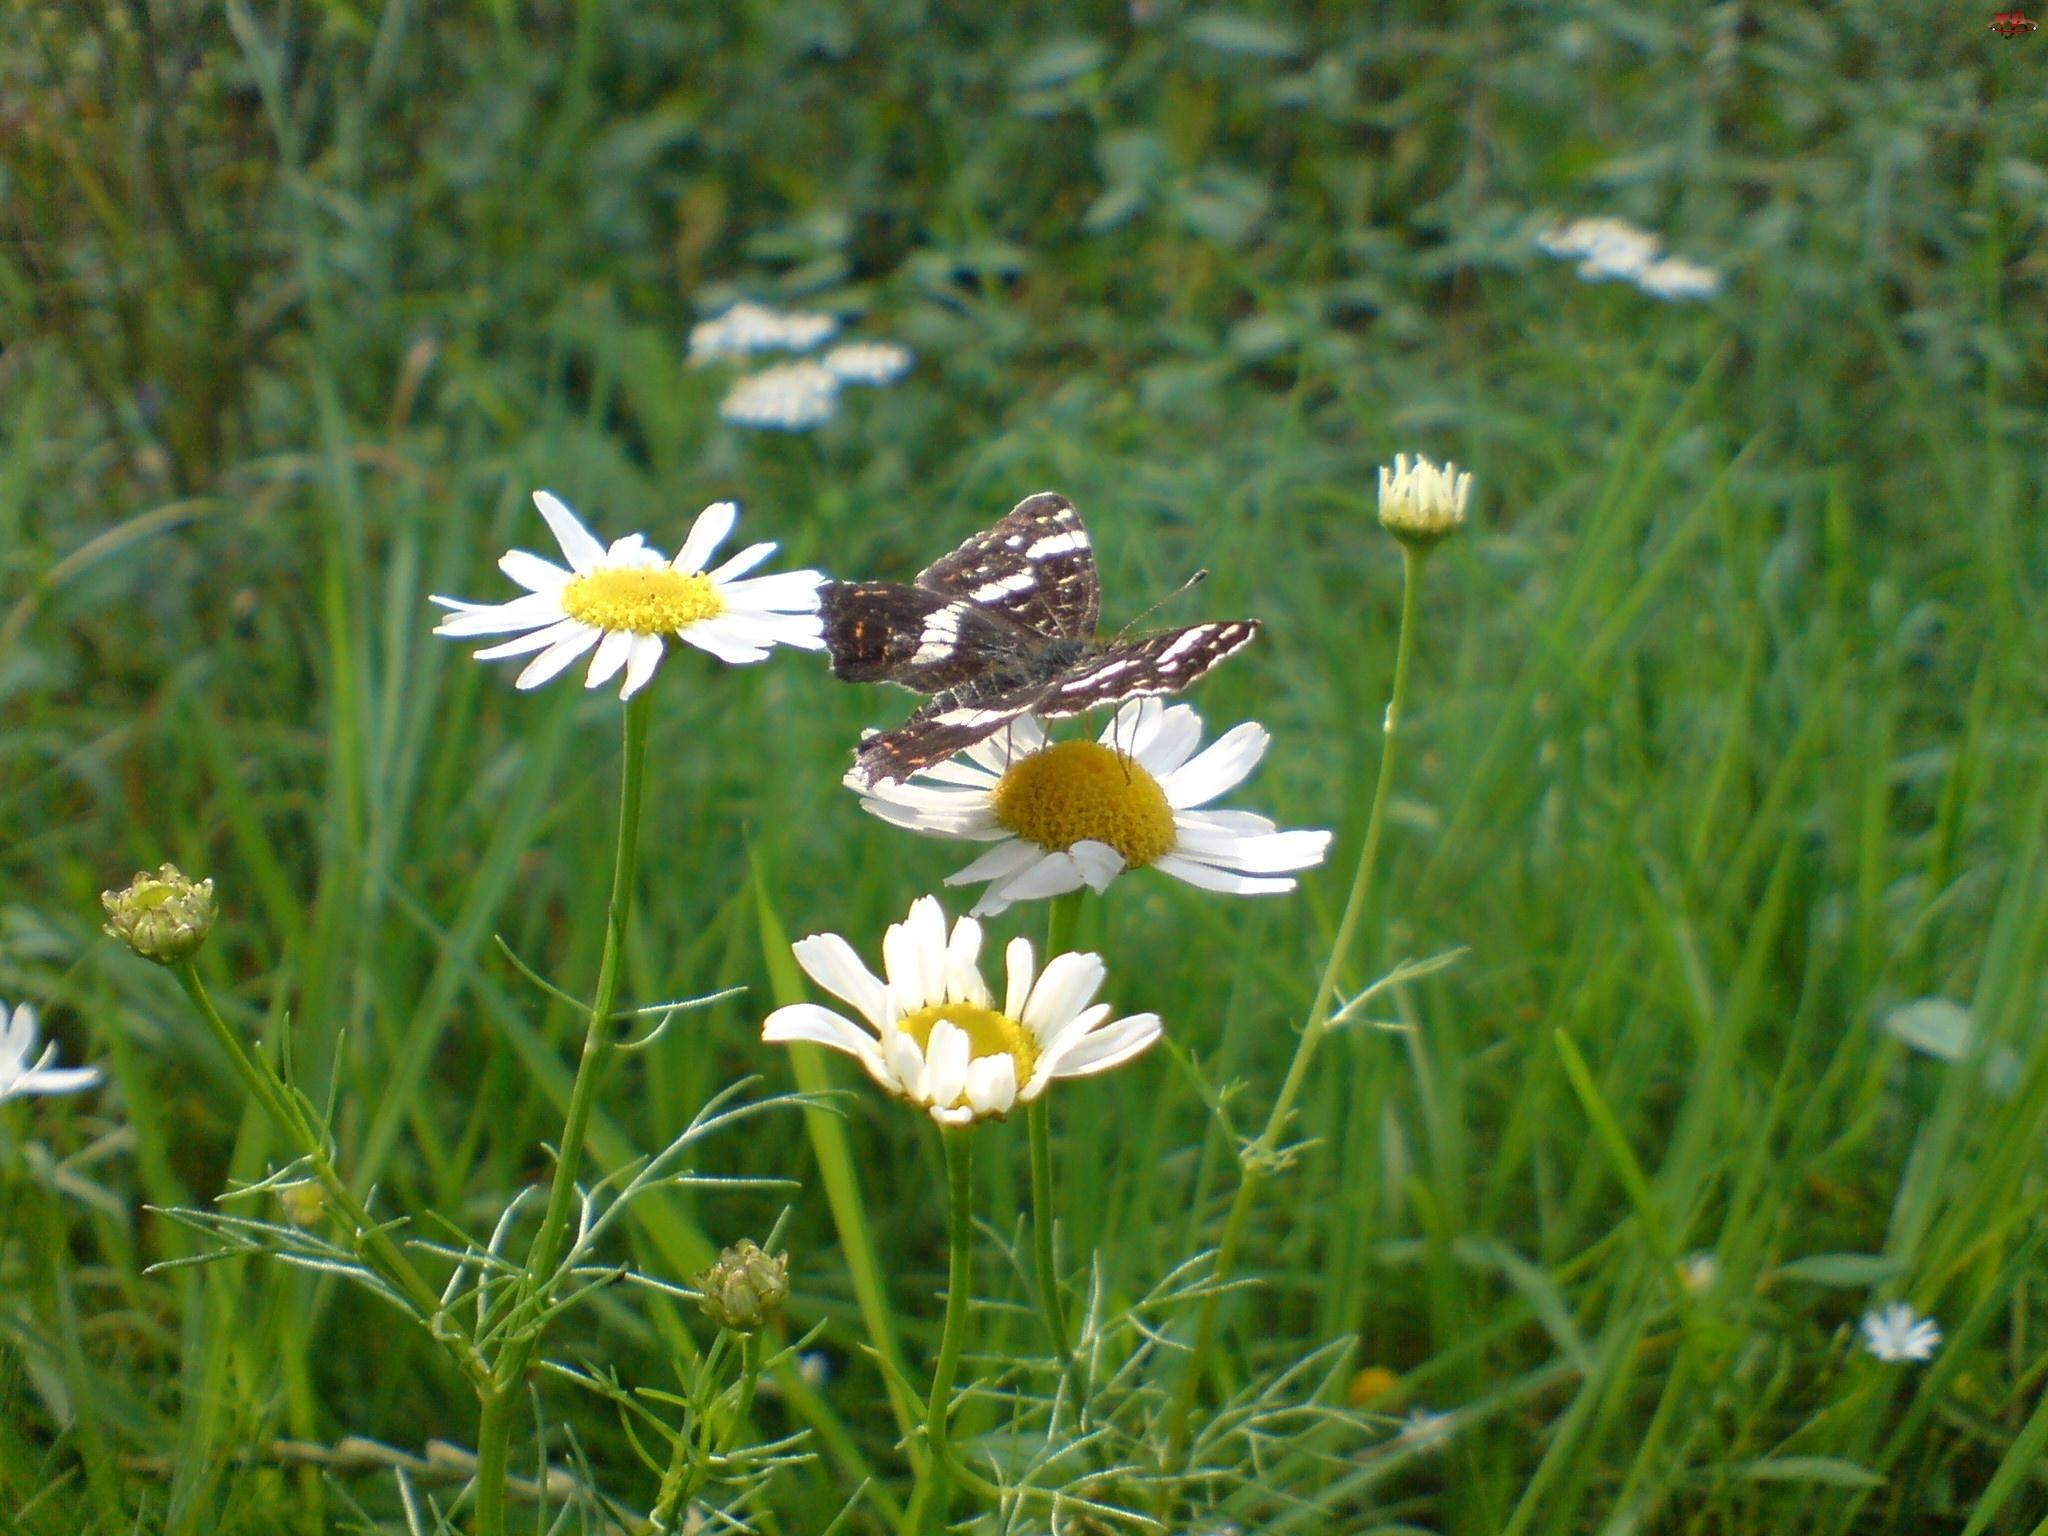 Rumianek pospolity, Motyl, Łąka